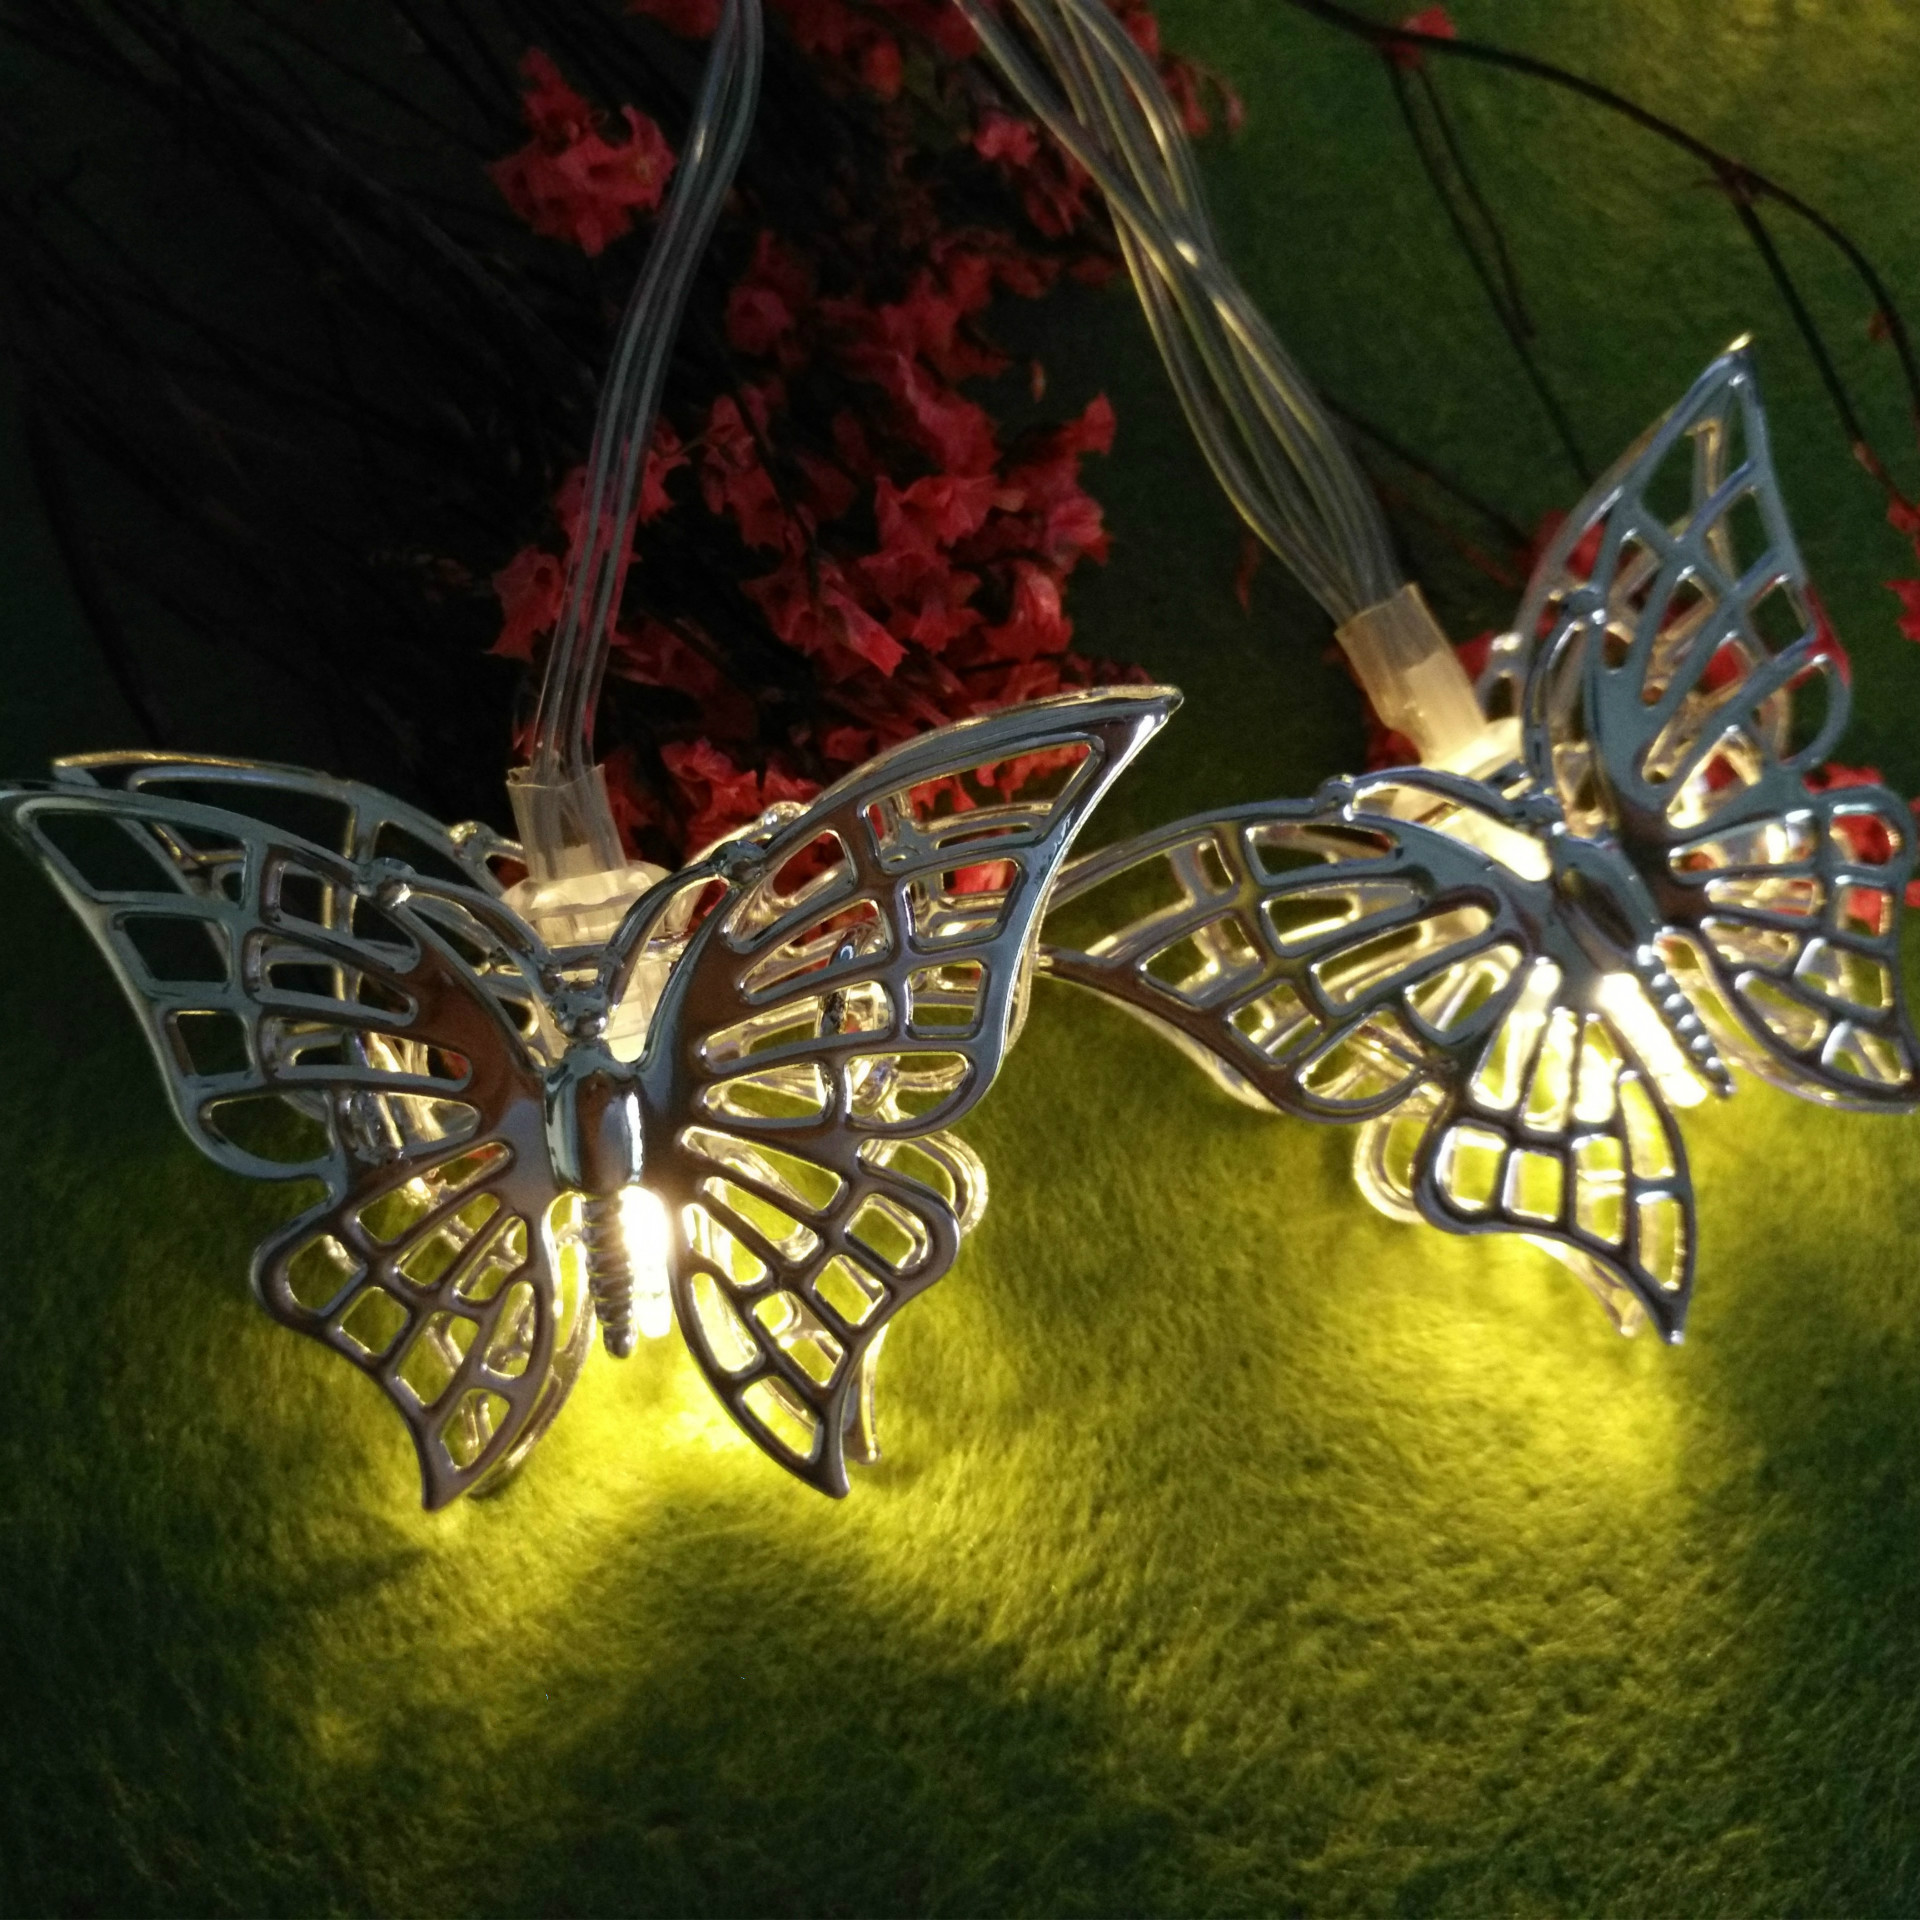 Outdoor Lighting Faithful Butterfly Led String 10led/20led Battery Powered Girls Room Decoration Lighting Indoor Light Wall Decoration Lamp Iy310202 Lights & Lighting